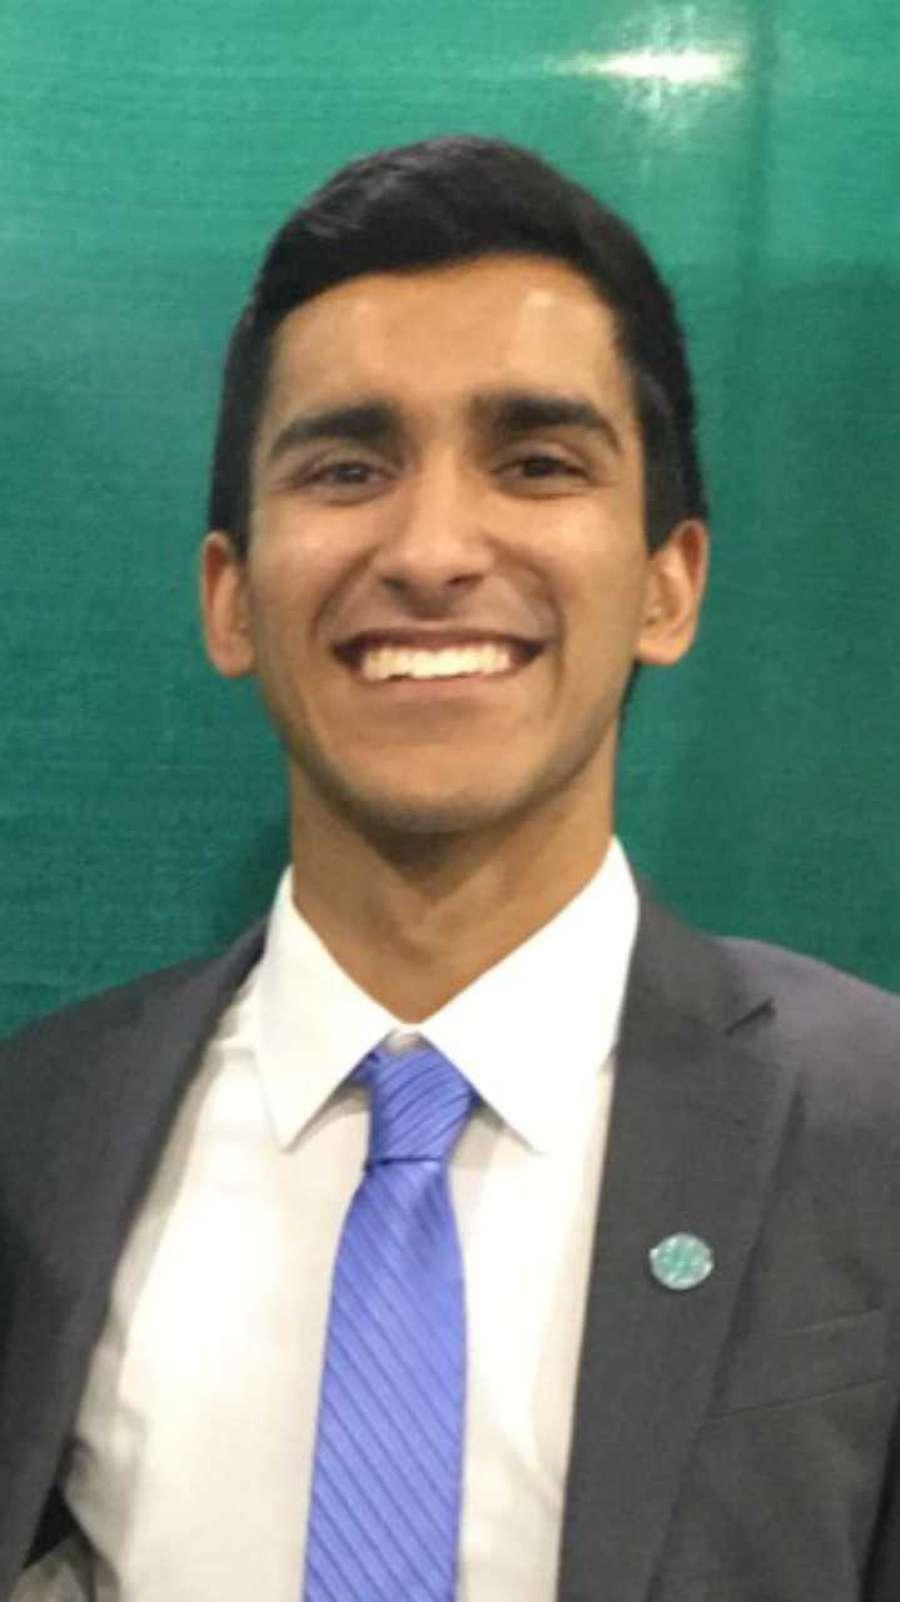 Arshad Shams Mandani is a 2018 co-valedictorian in the International Baccalaureate program at Palm Harbor University High School.